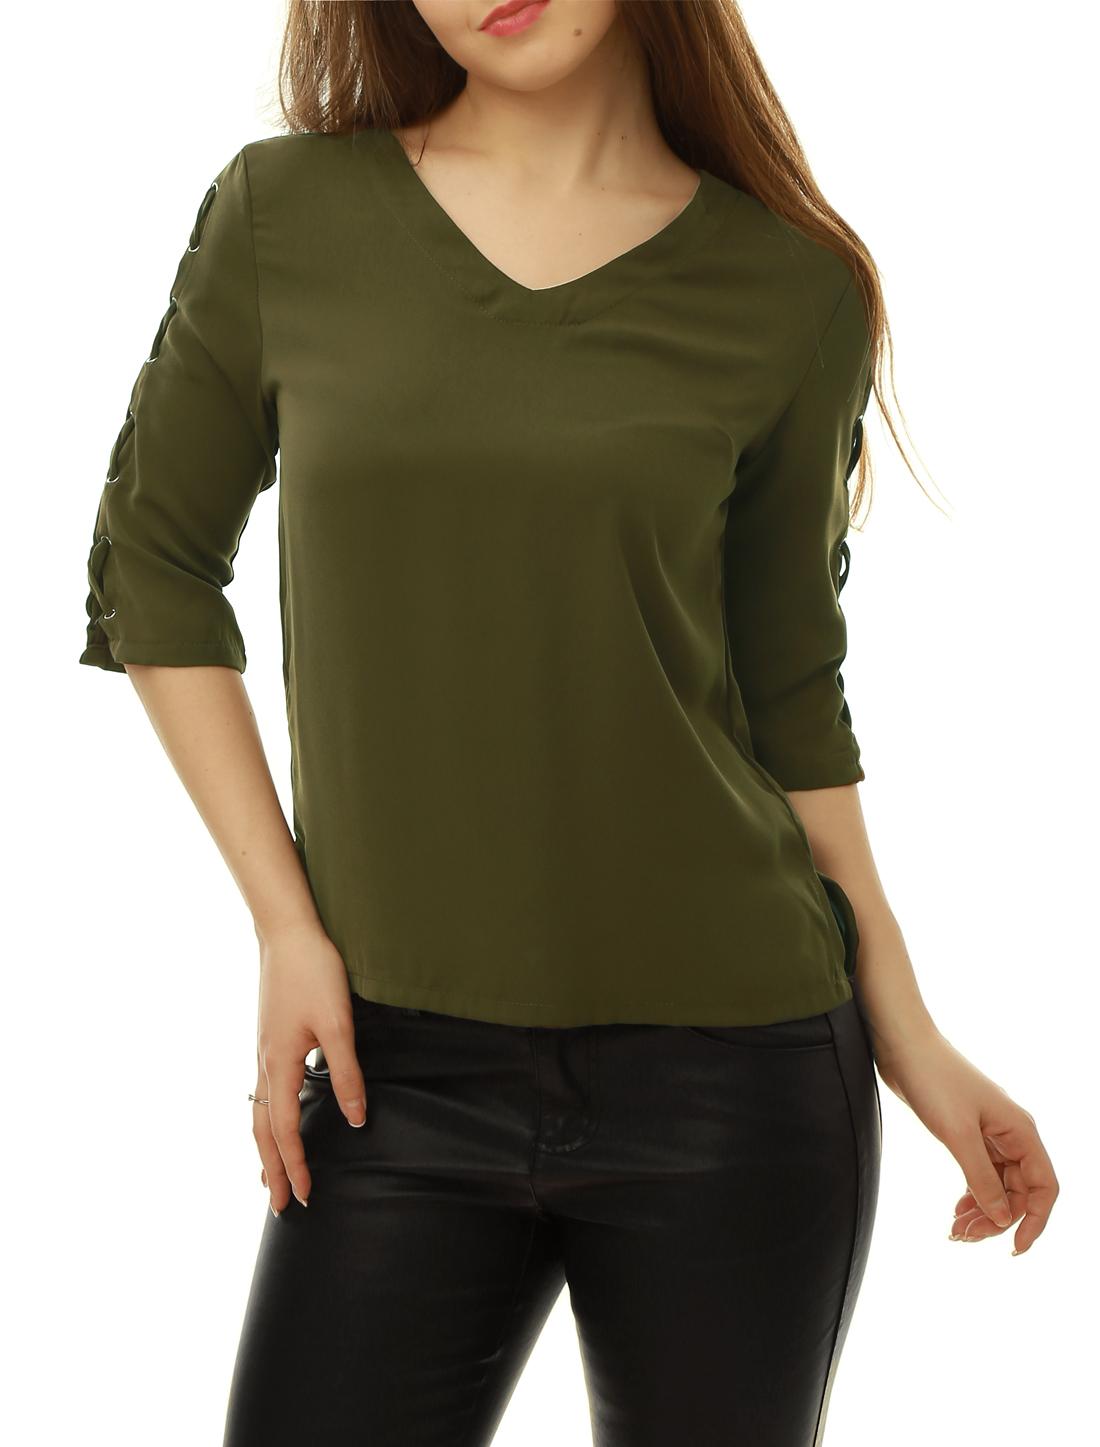 Women Three Quarter Lace Up Sleeves V Neck Side-Slit Top Green L